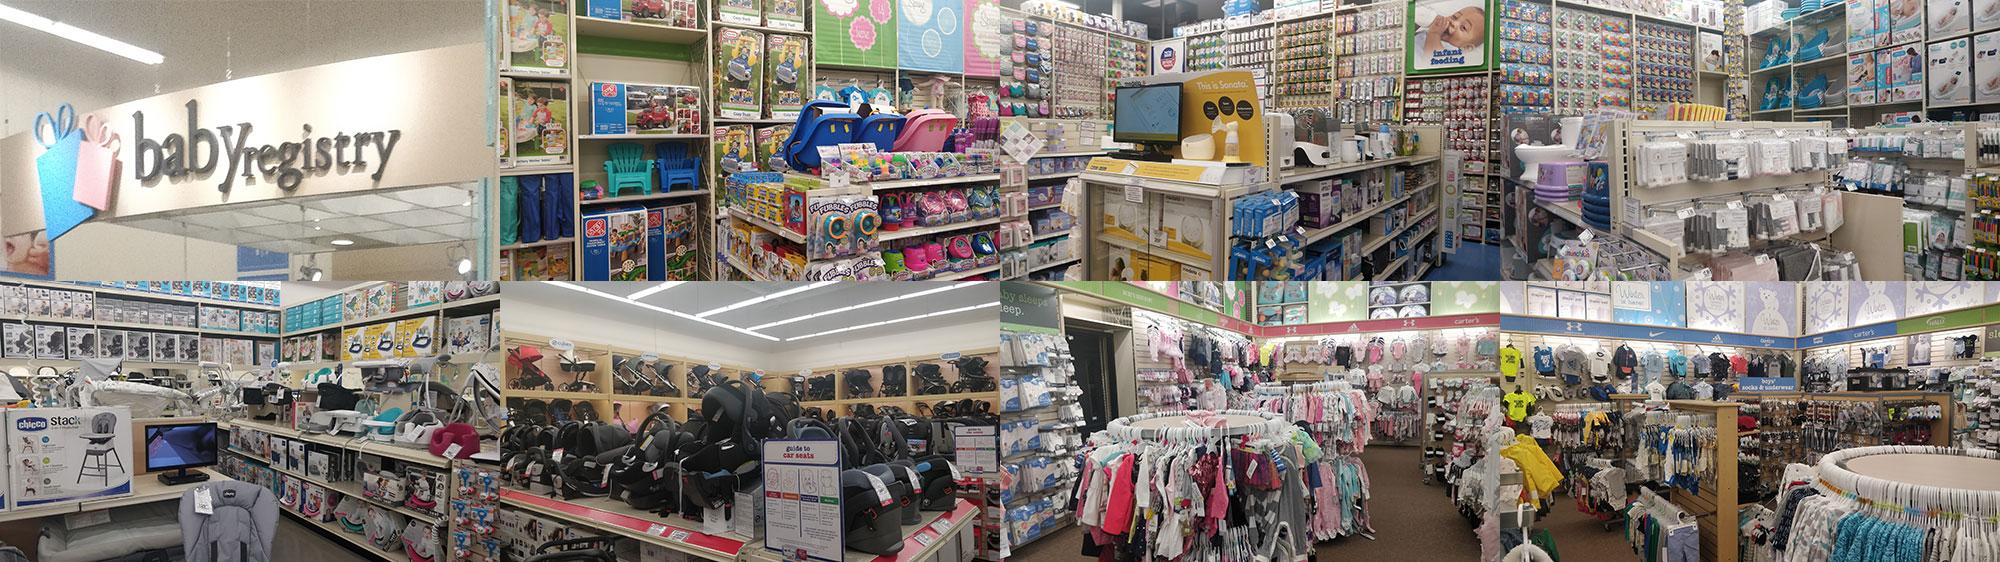 Inside Buy Buy Baby In Tukwila, WA